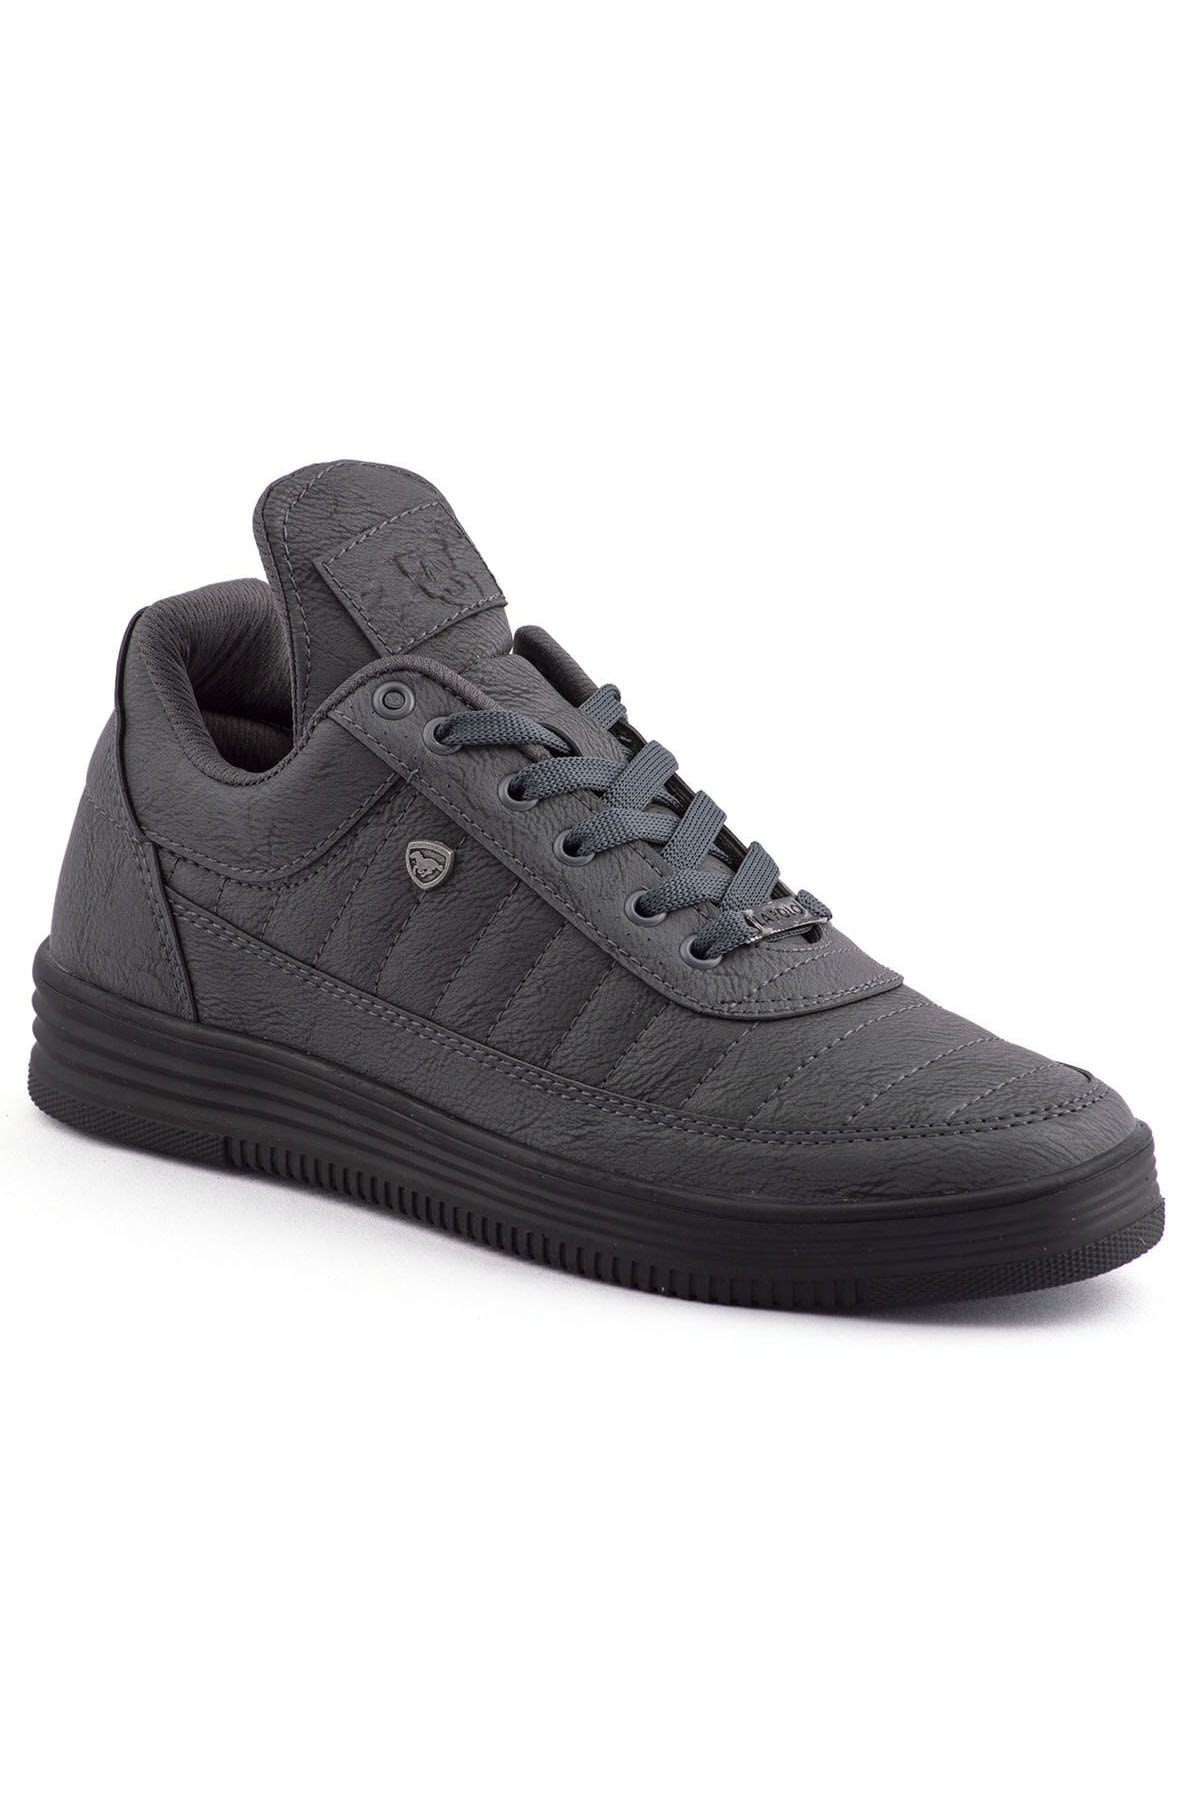 L.A Polo 07 Füme Siyah Dikişli Taban Unisex Spor Ayakkabı 1